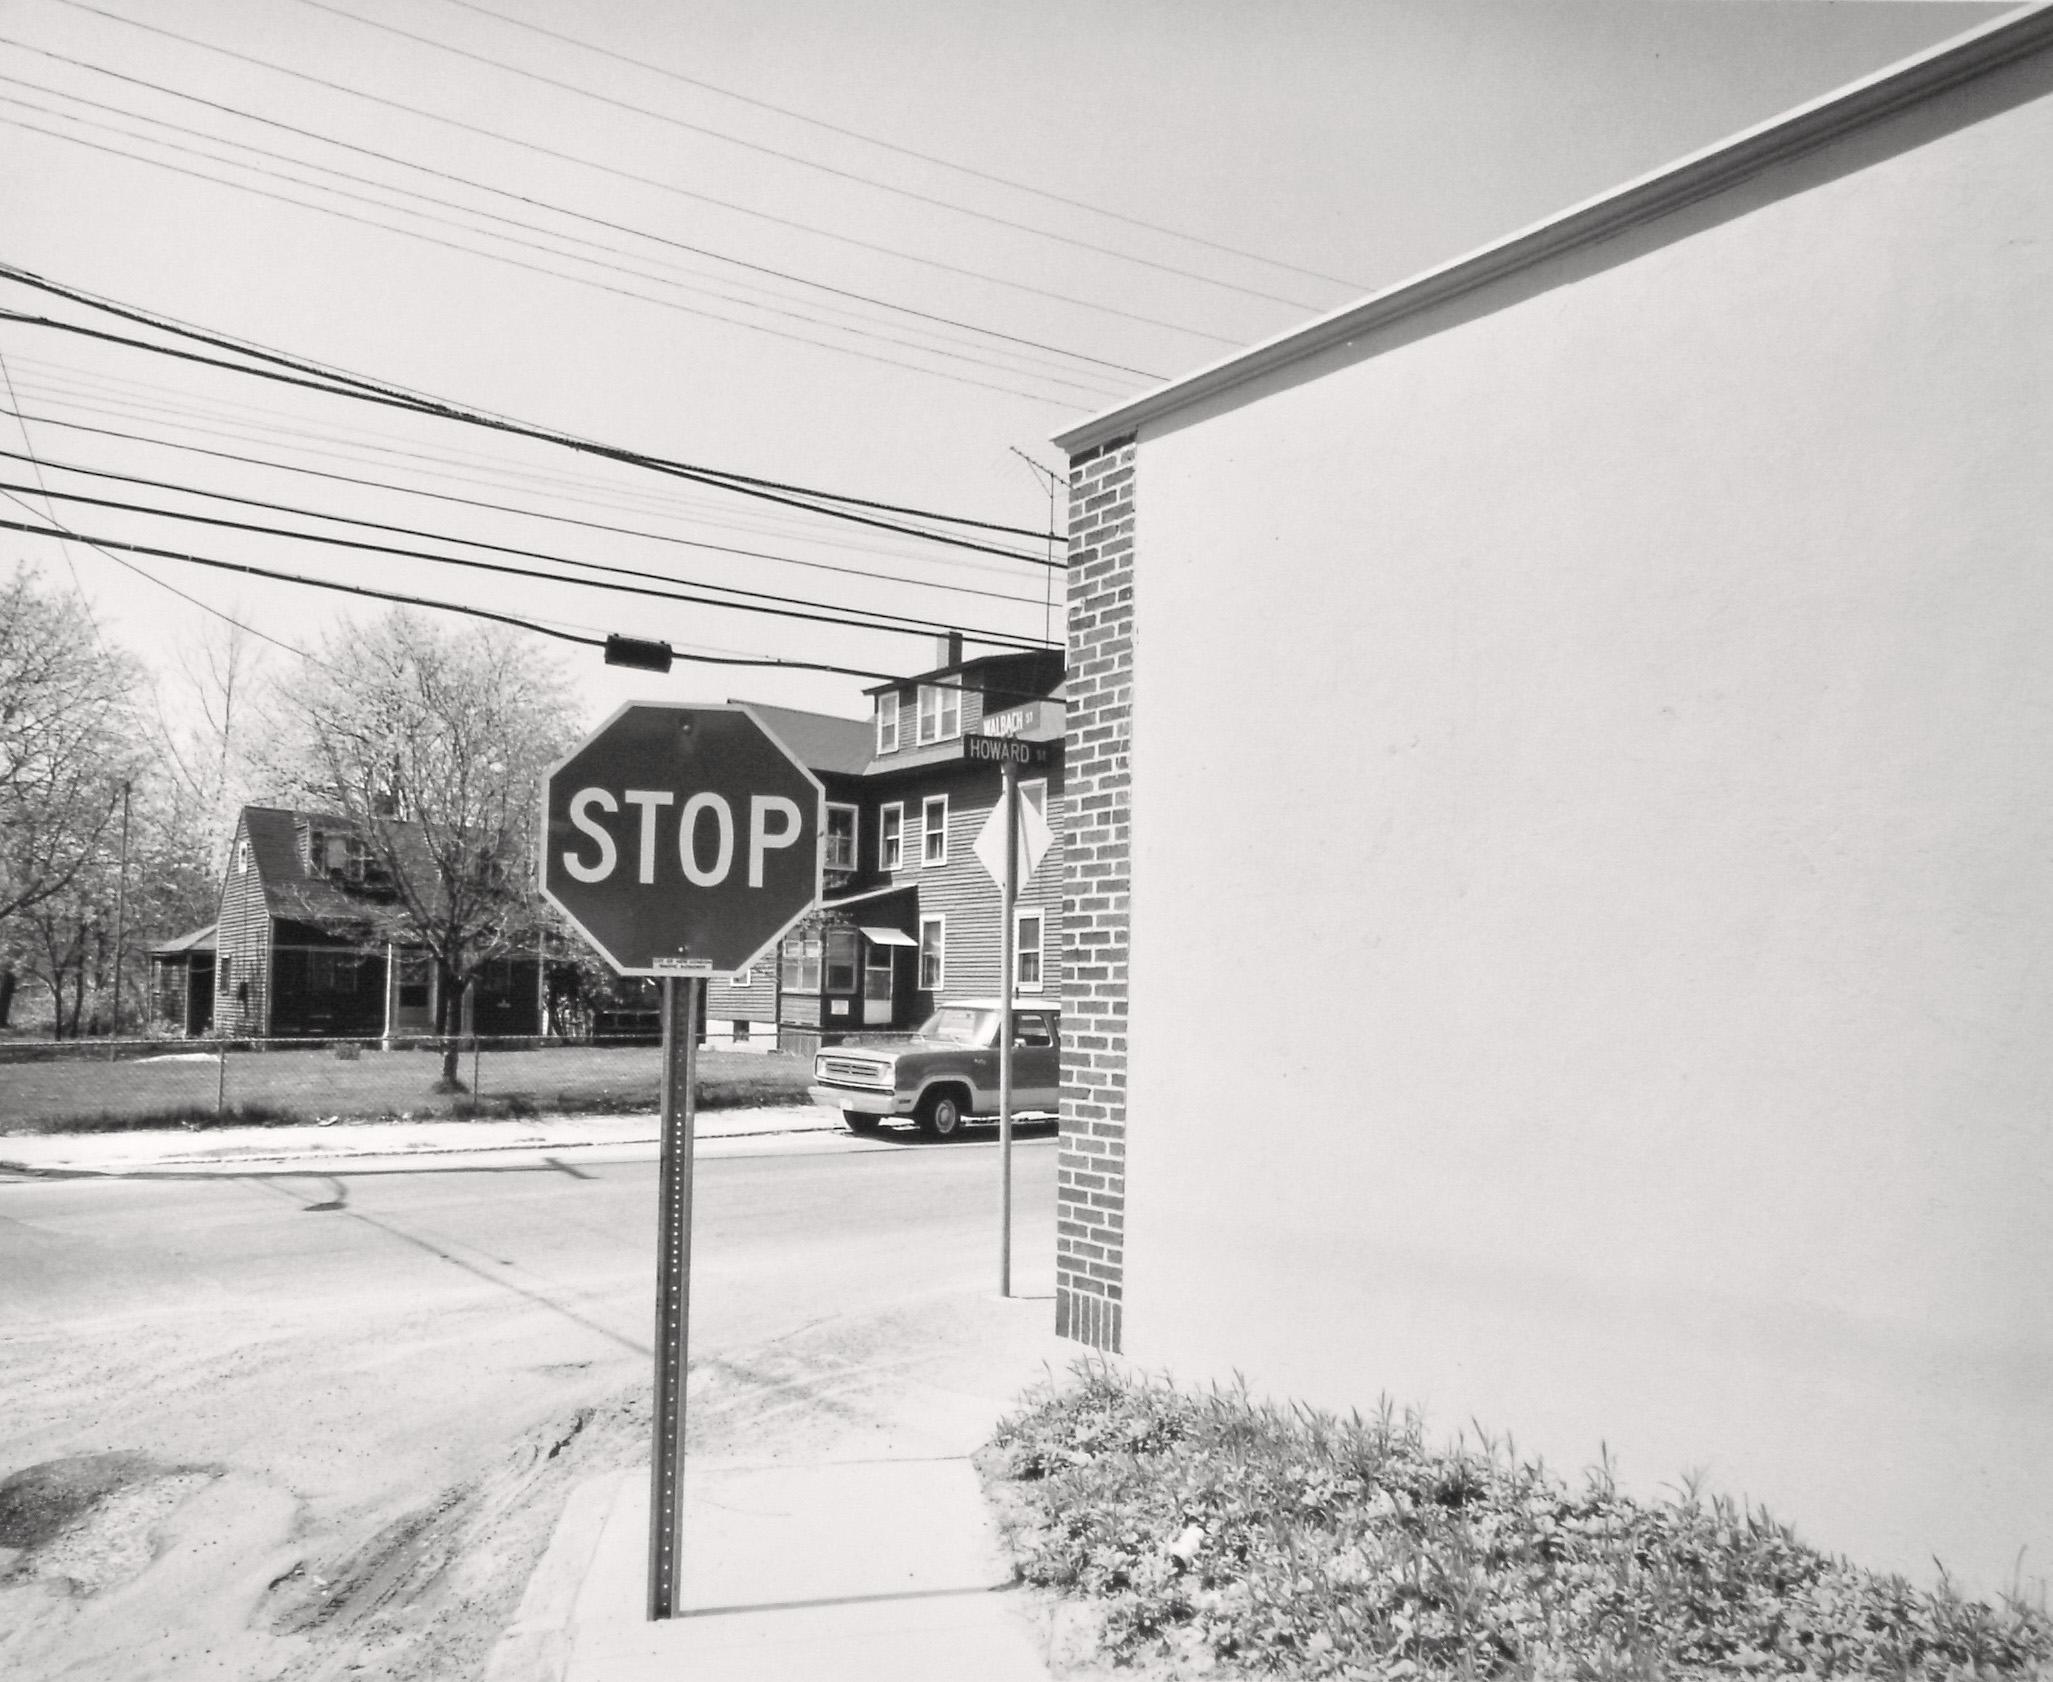 Ted Hendrickson, Howard St and Walbach St,  New London, CT